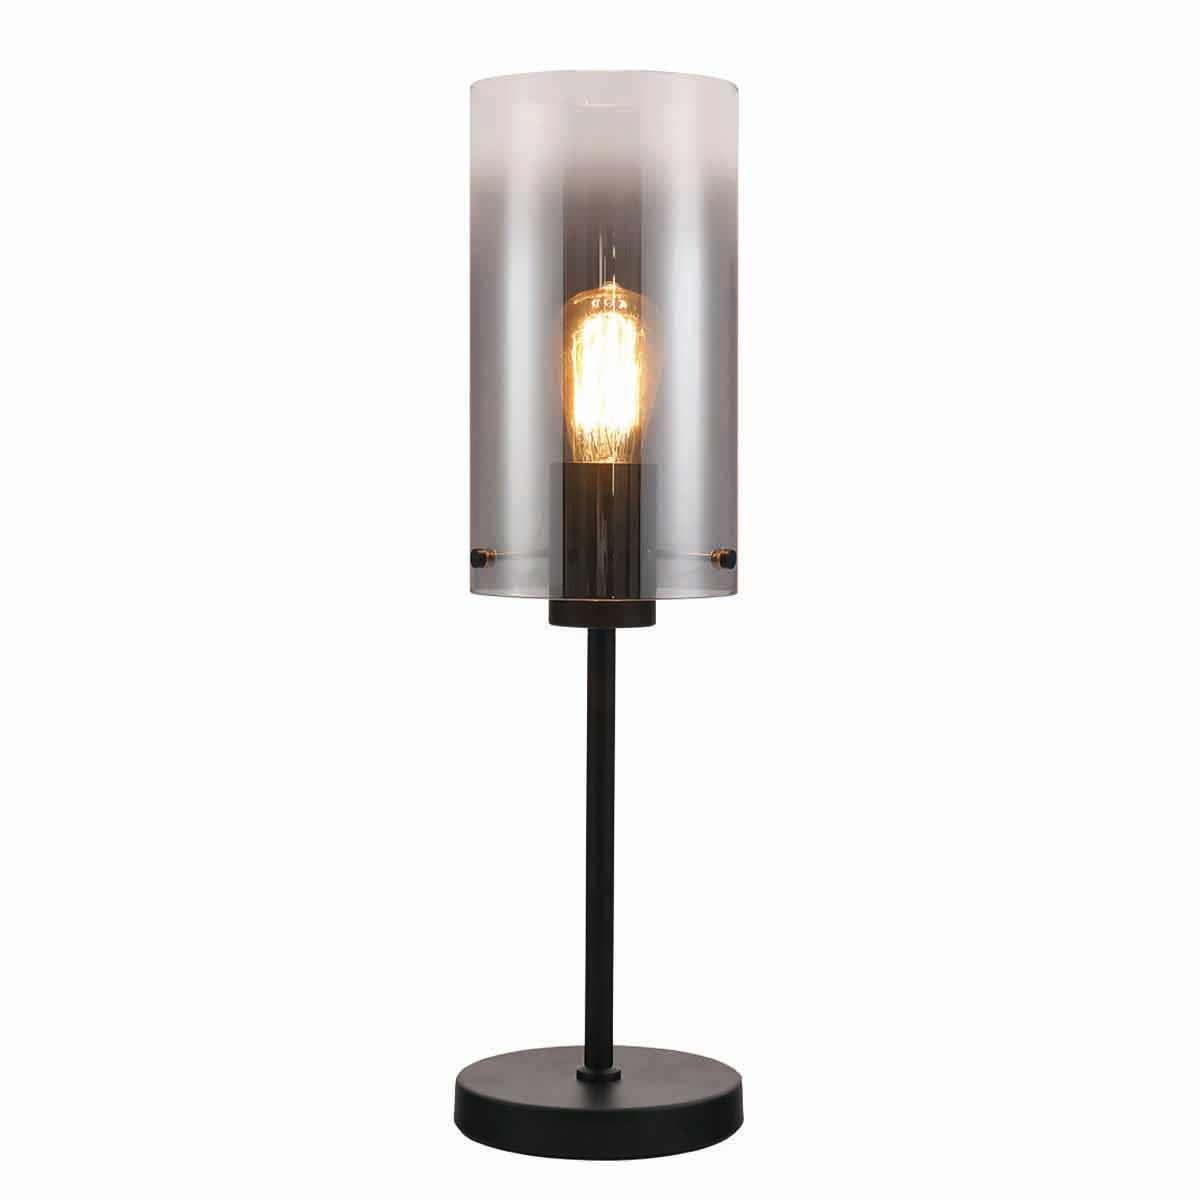 Freelight Tafellamp Ventotto H 58 cm Ø 15 cm rook glas zwart